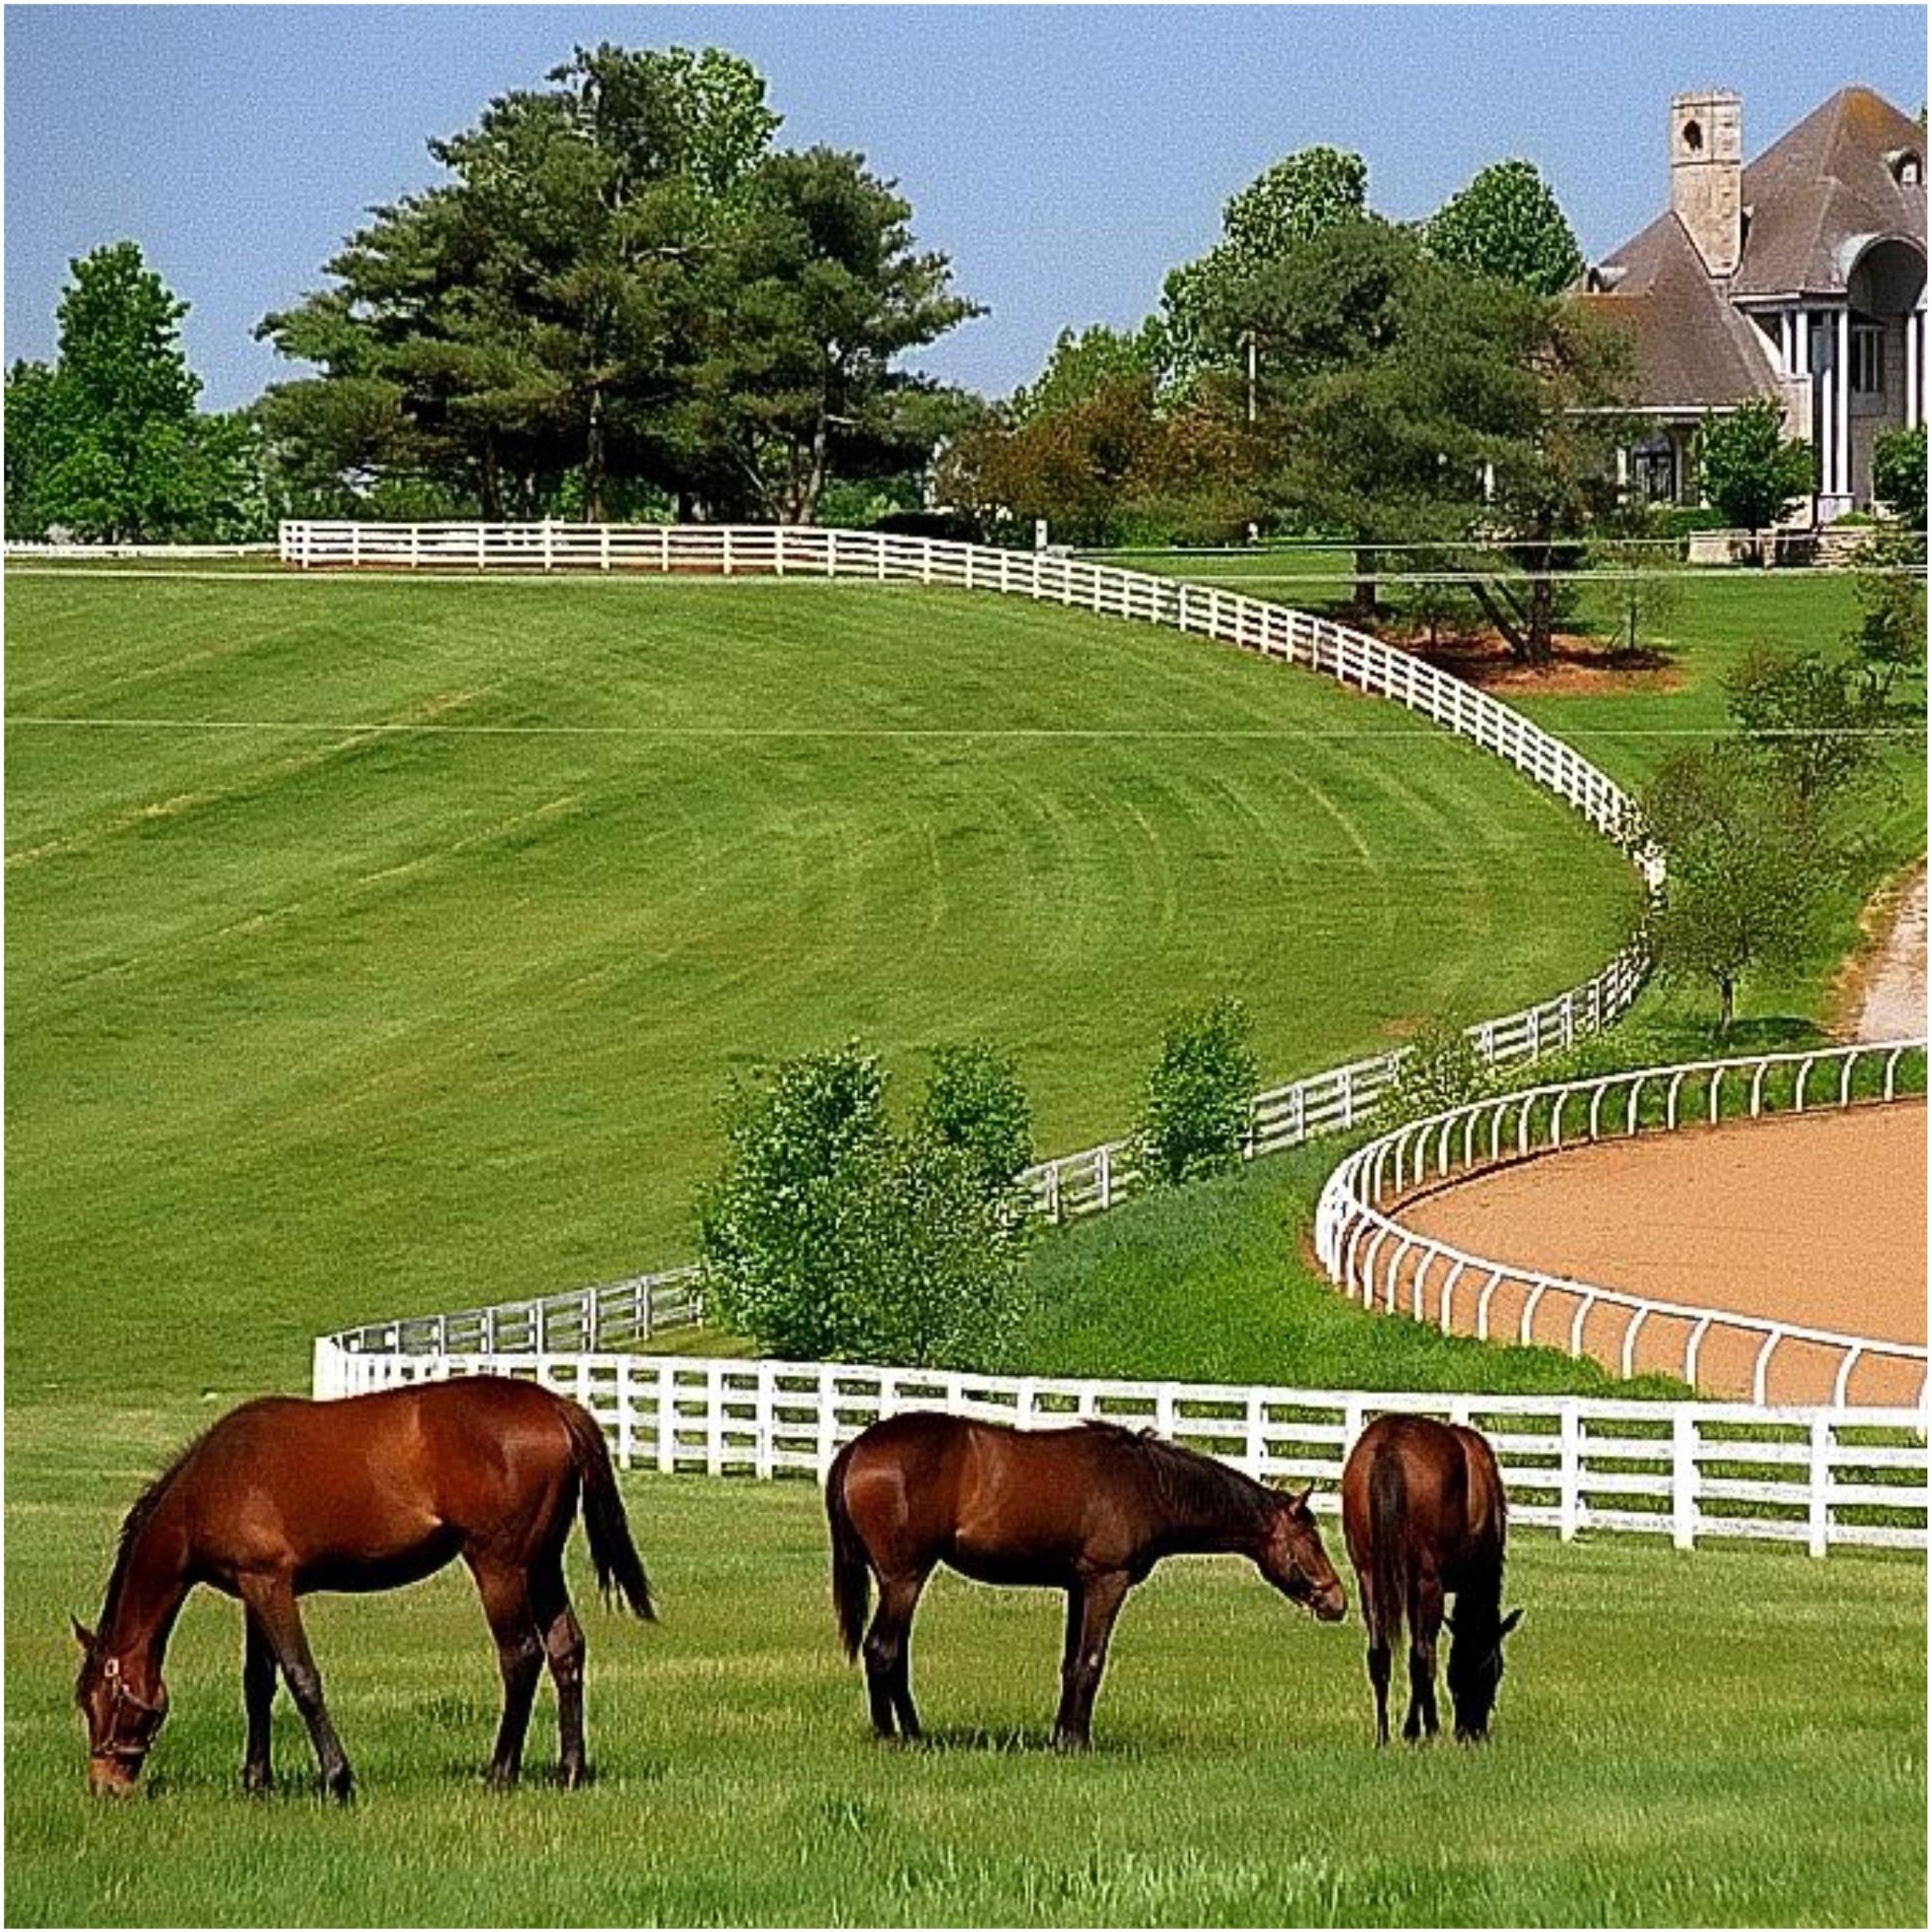 Horse Farm Picnic.jpg